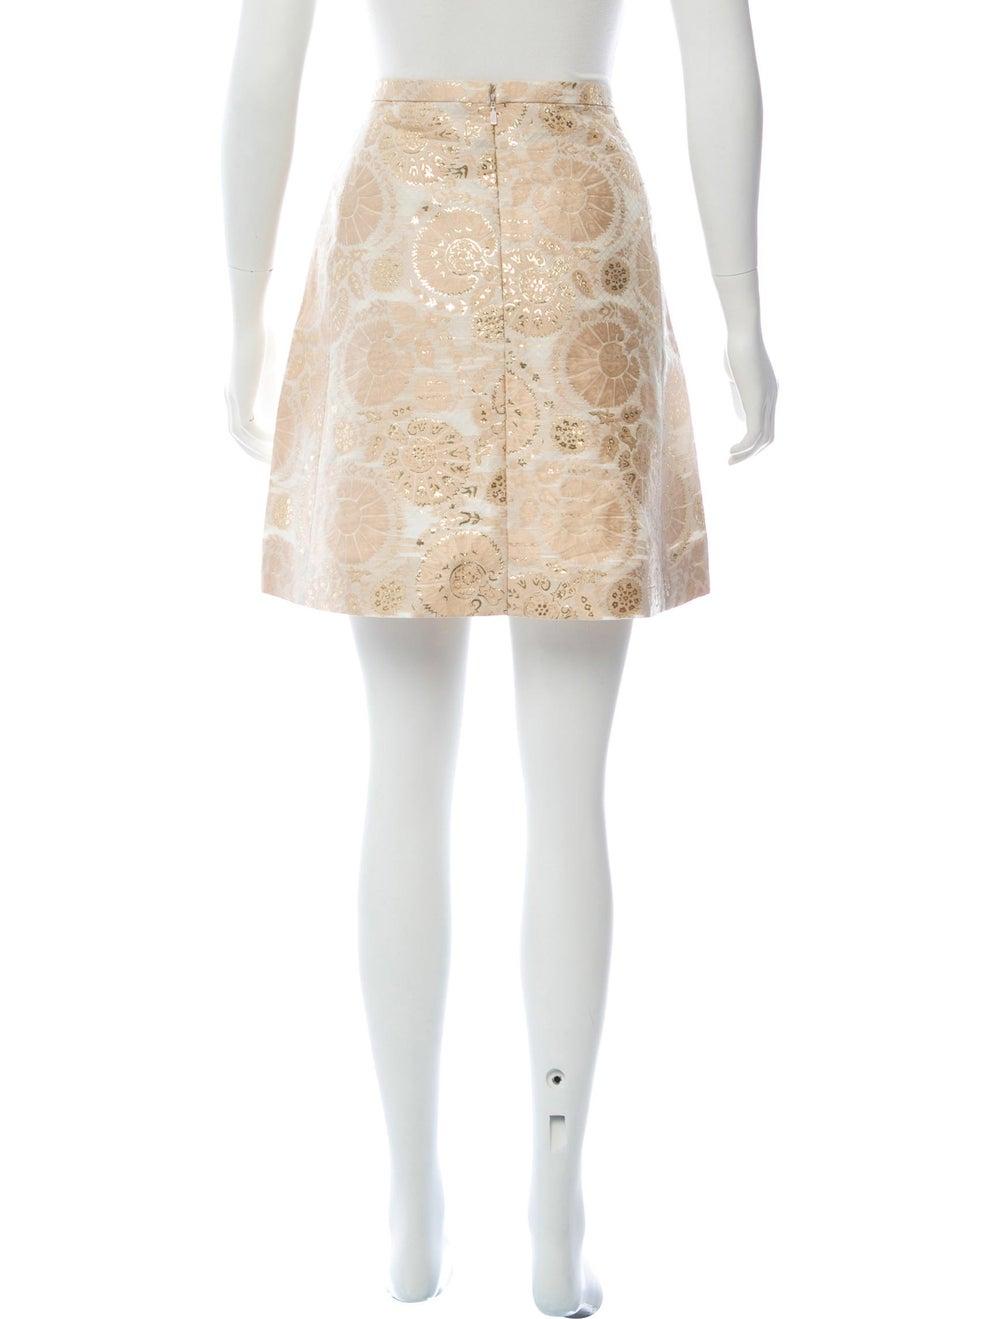 Chloé Silk Brocade Mini Skirt Pink - image 3